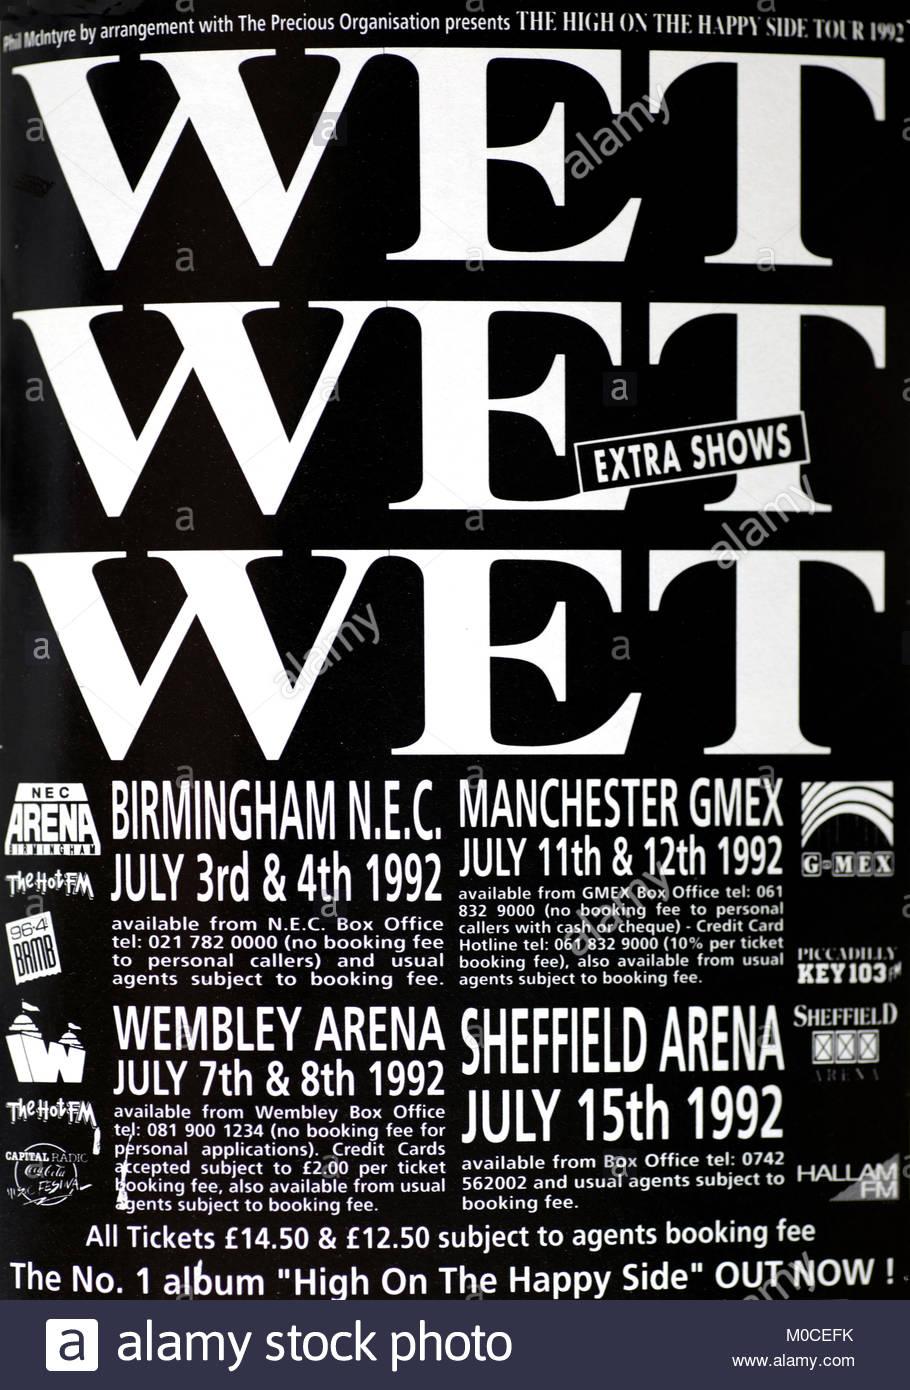 Magazine advert with UK tour dates for  Wet Wet Wet 1992 - Stock Image